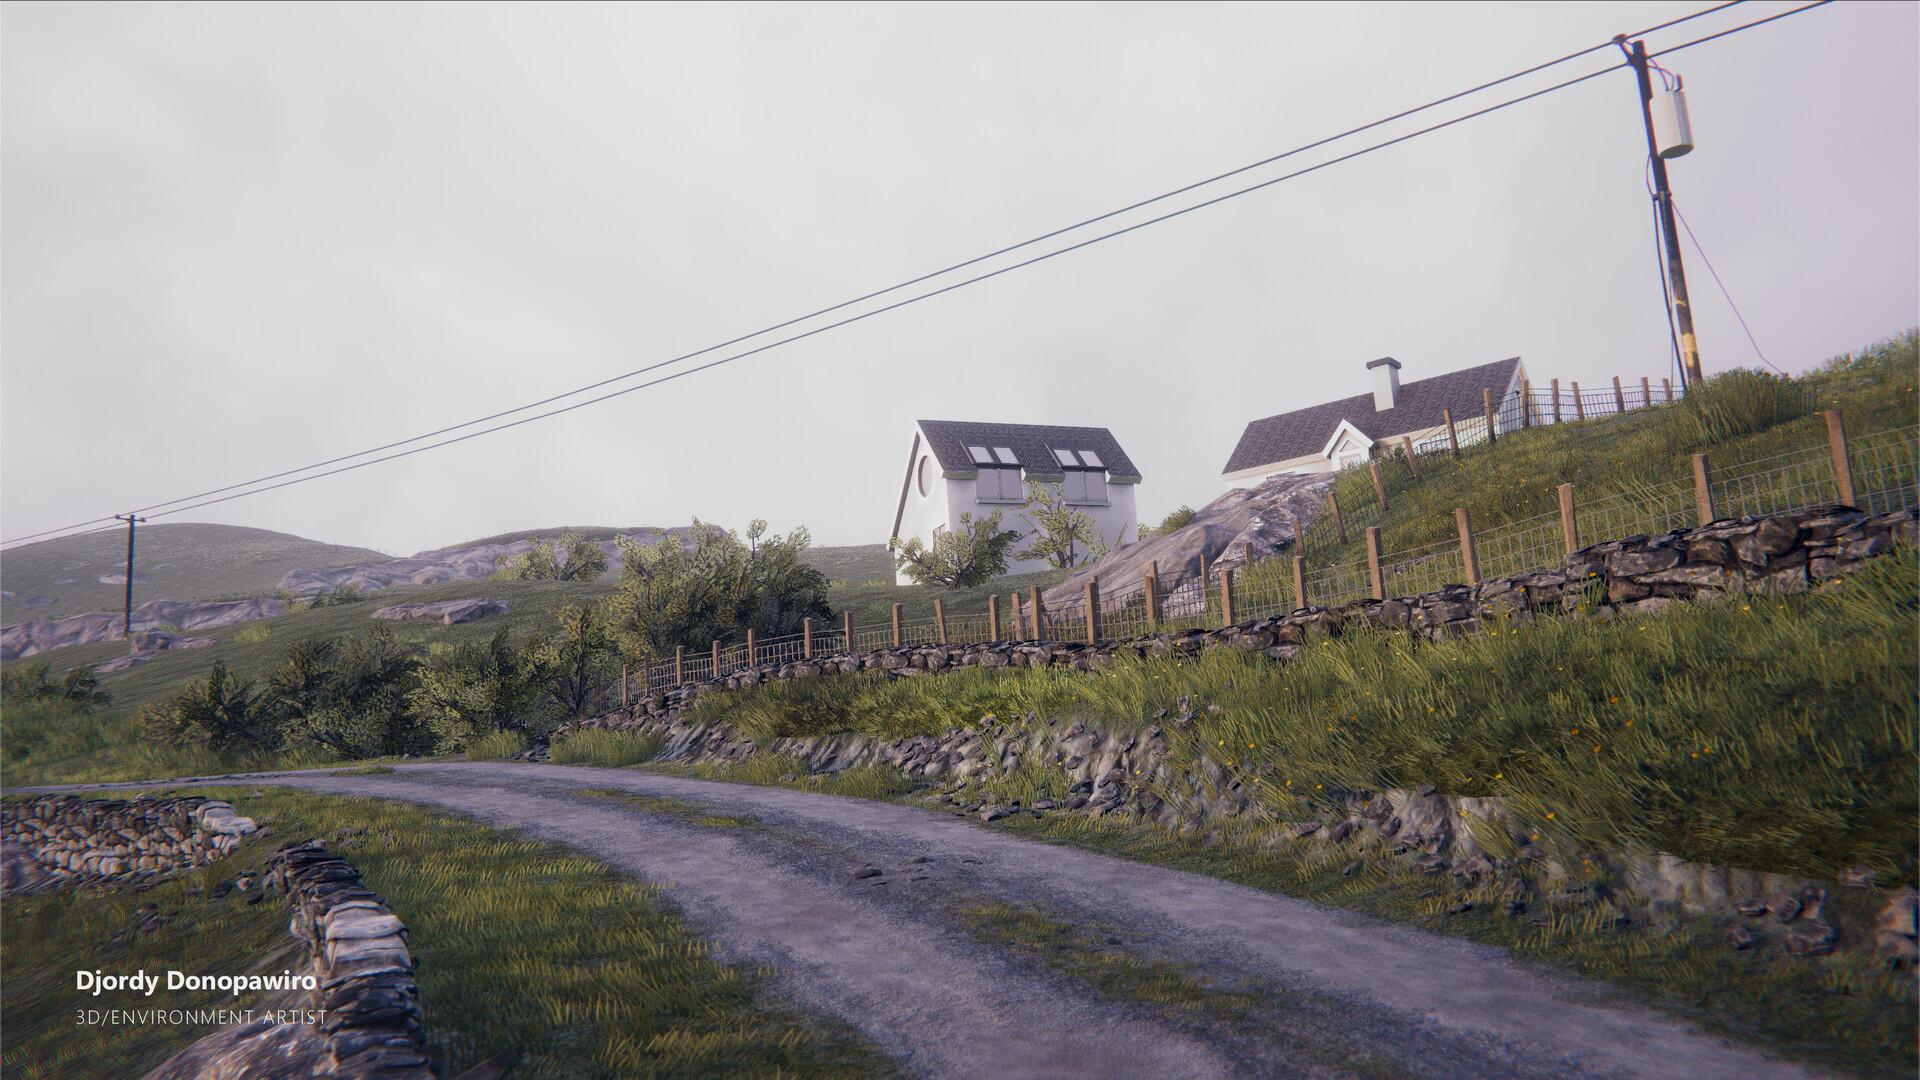 ArtStation - Derryharbor Unity scene, Djordy Donopawiro